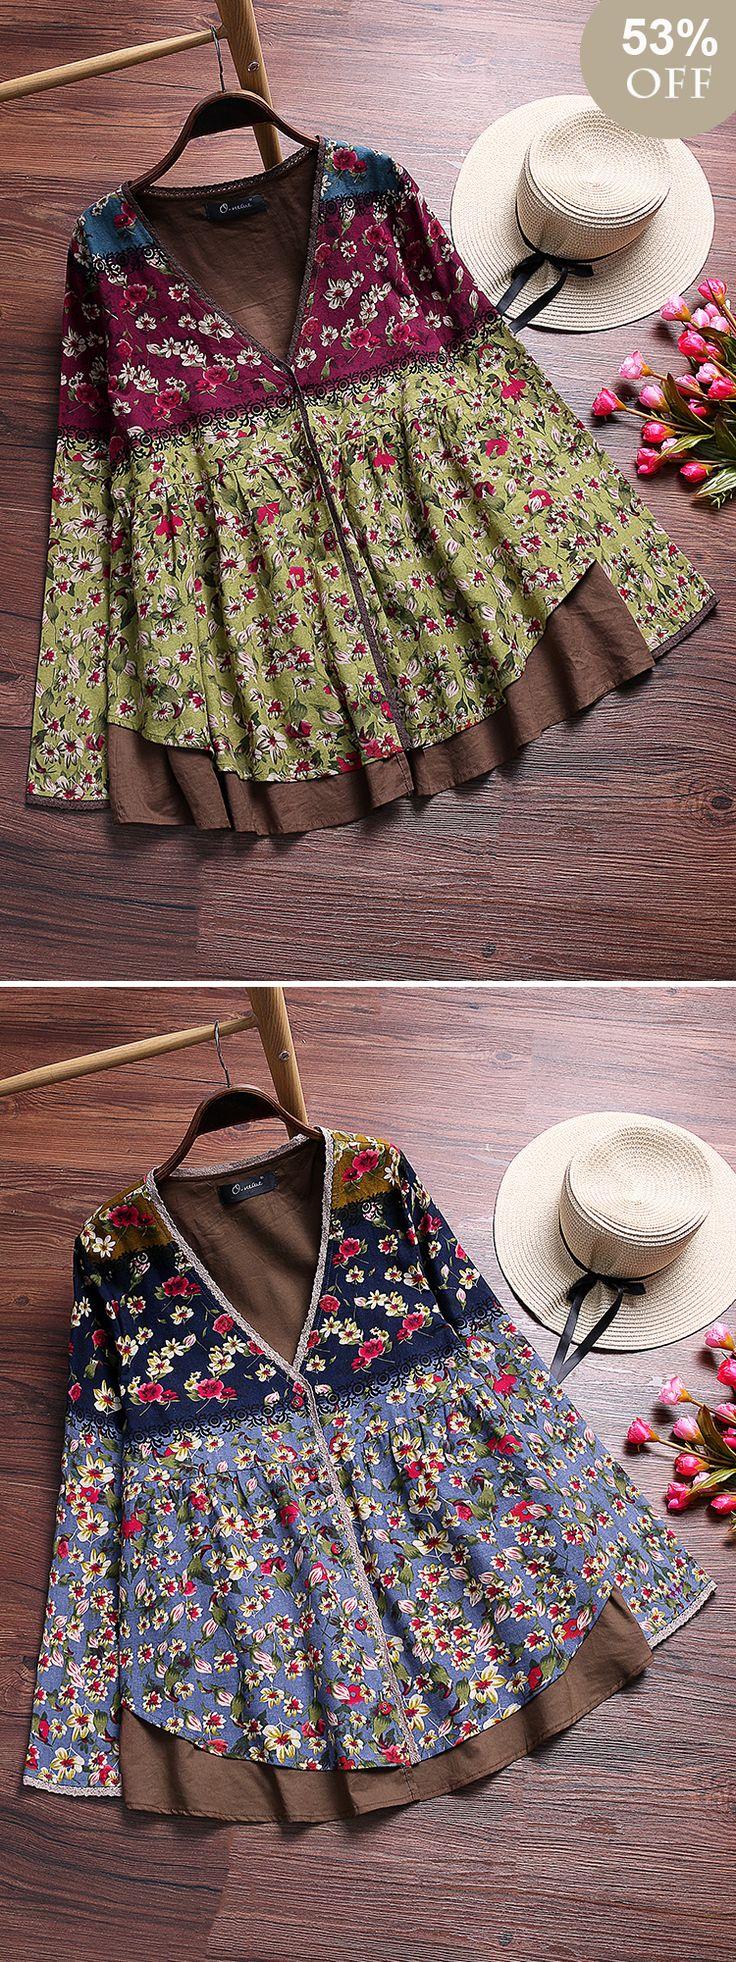 Vintage Floral Printed Patchwork V-Neck Fake Two-Piece Shirt #top #fashion